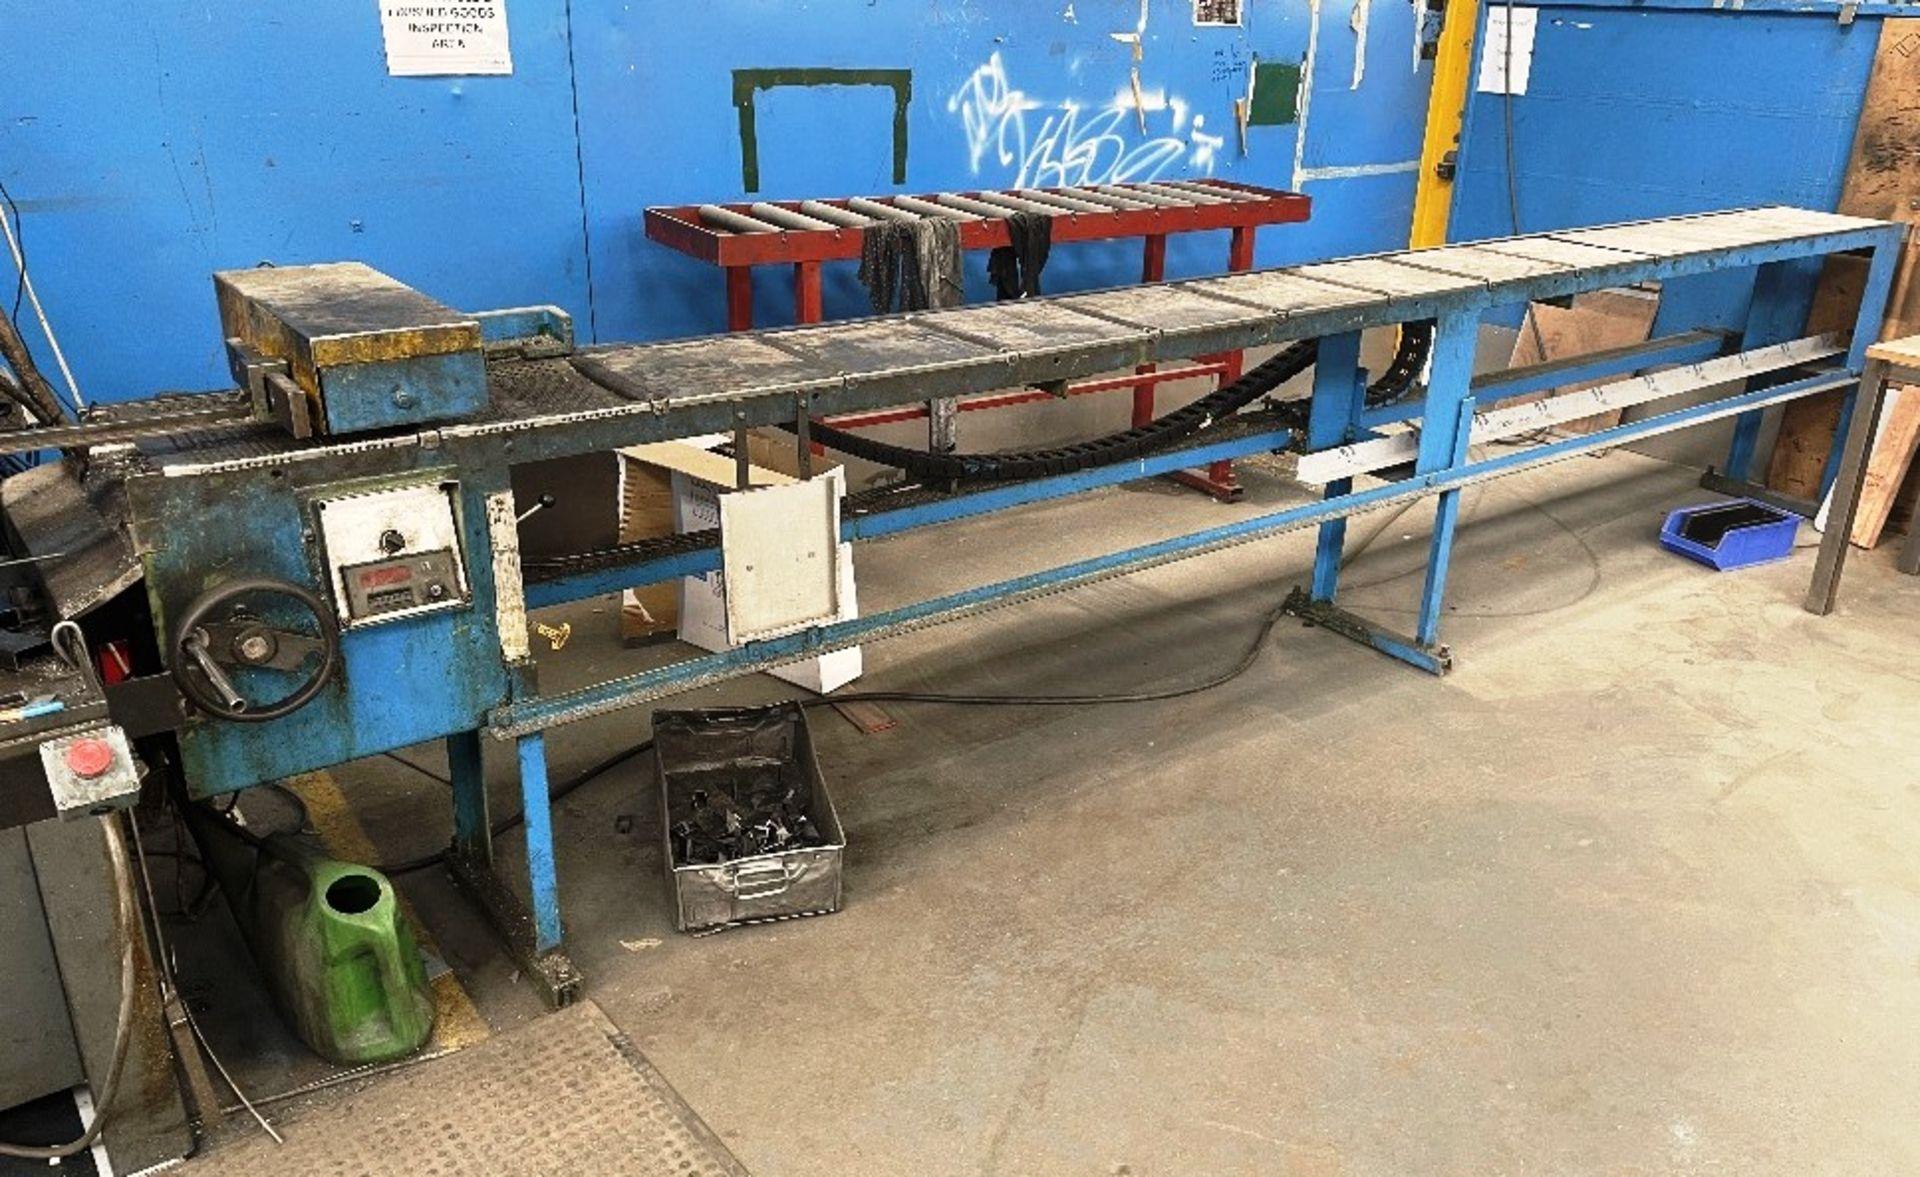 Pedrazzoli Brown SC 300 Horizontal Bandsaw w/ 4m Powered Conveyor - Image 8 of 12